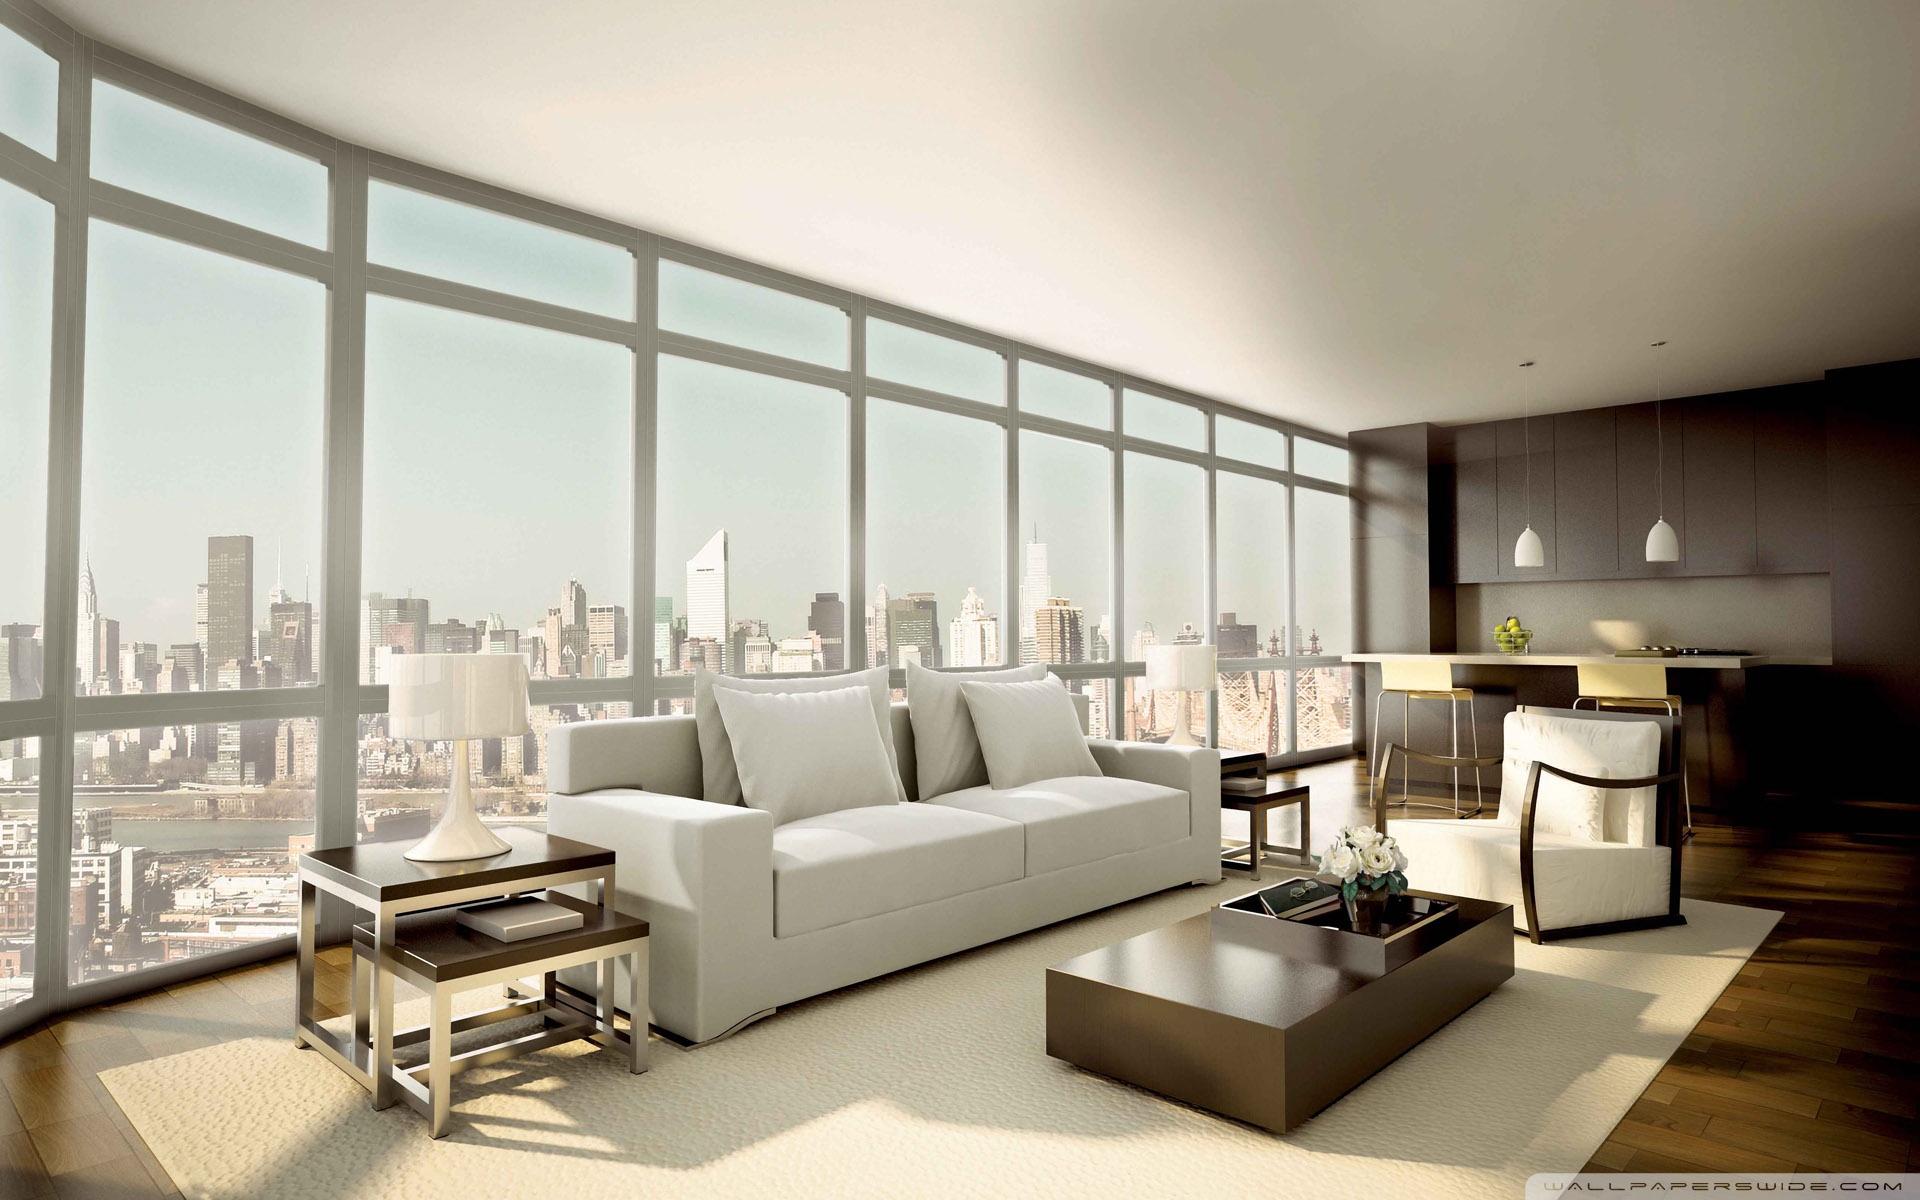 interior_design-wallpaper-1920x1200